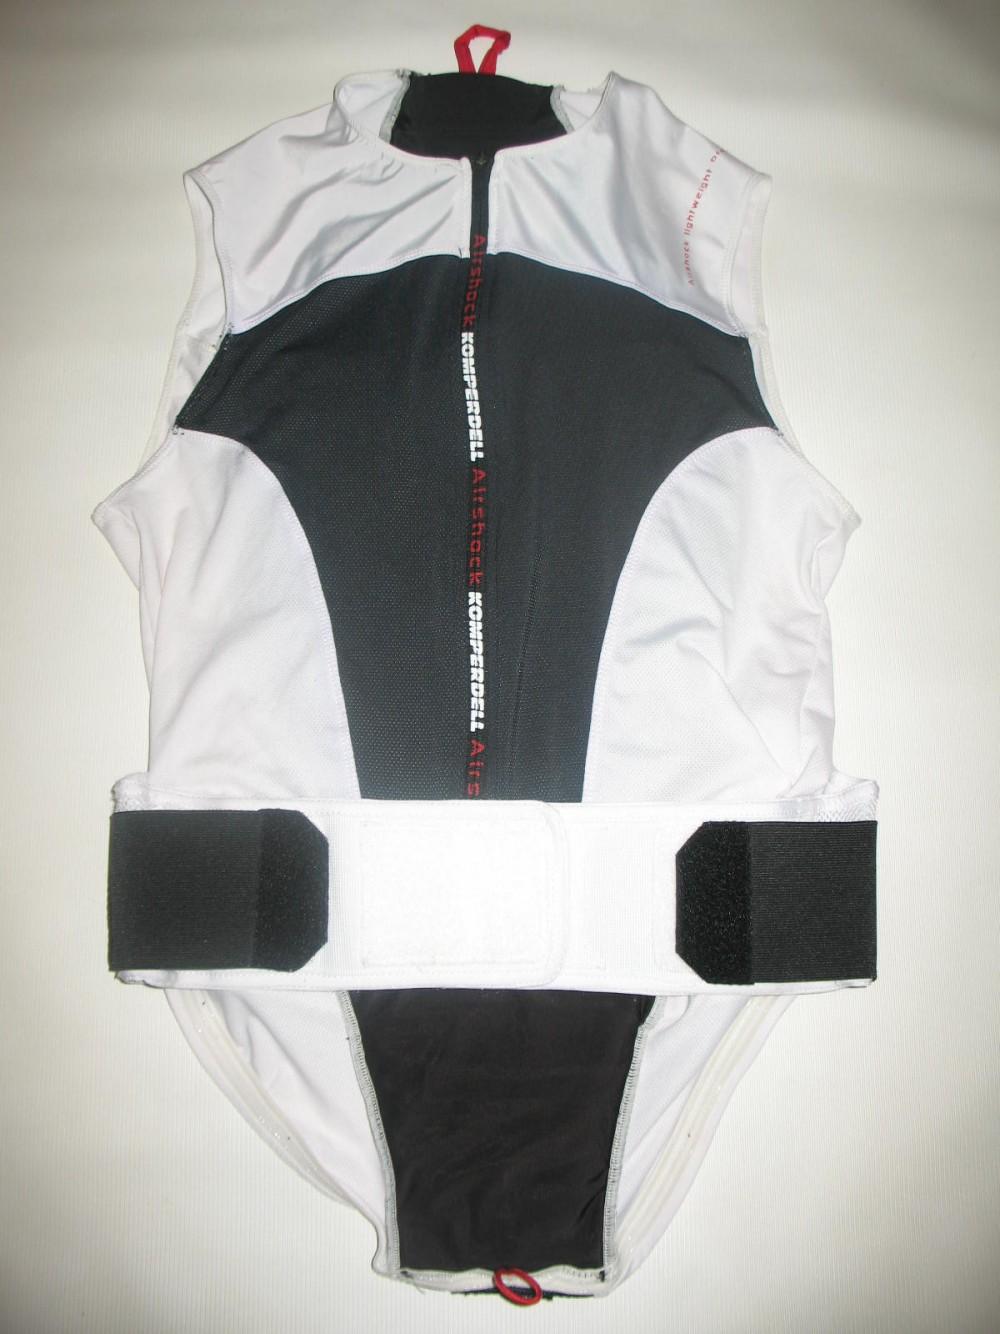 Жилет защита KOMPERDELL airshock vest back protector (размер M(на рост 170-180 см)) - 1